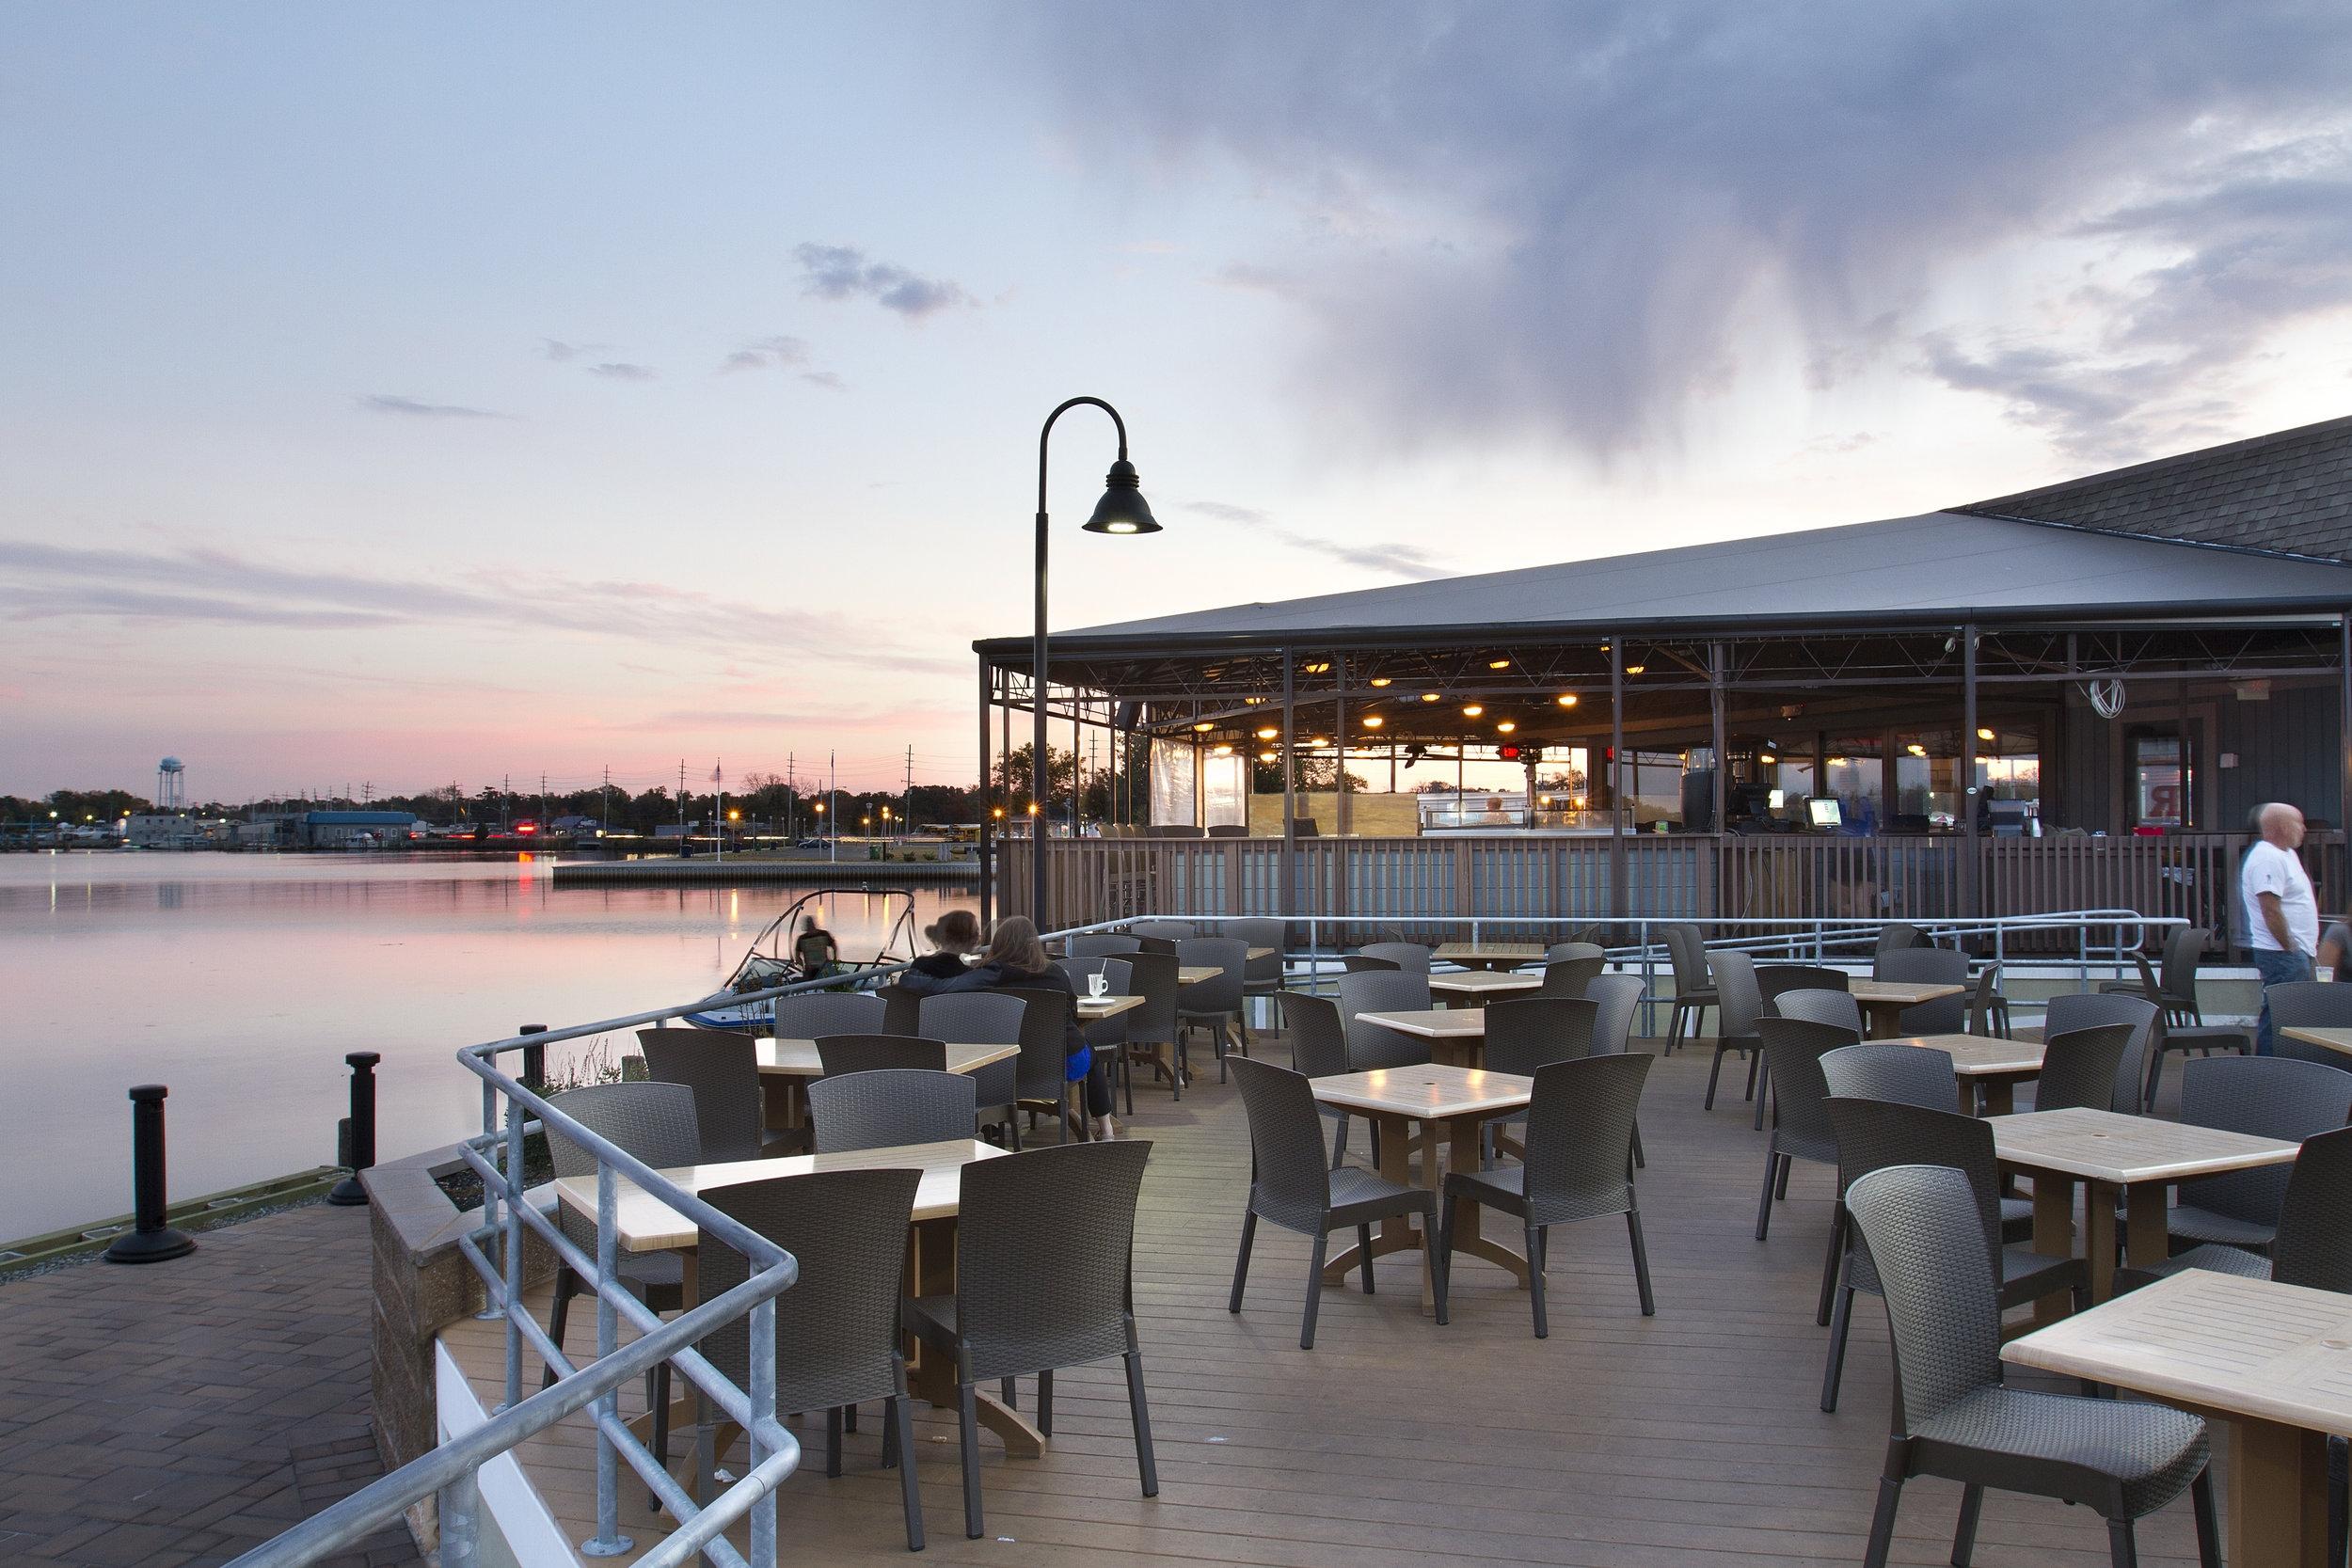 BAKER'S WATERSTREET BAR + GRILLE | TOMS RIVER, NJ